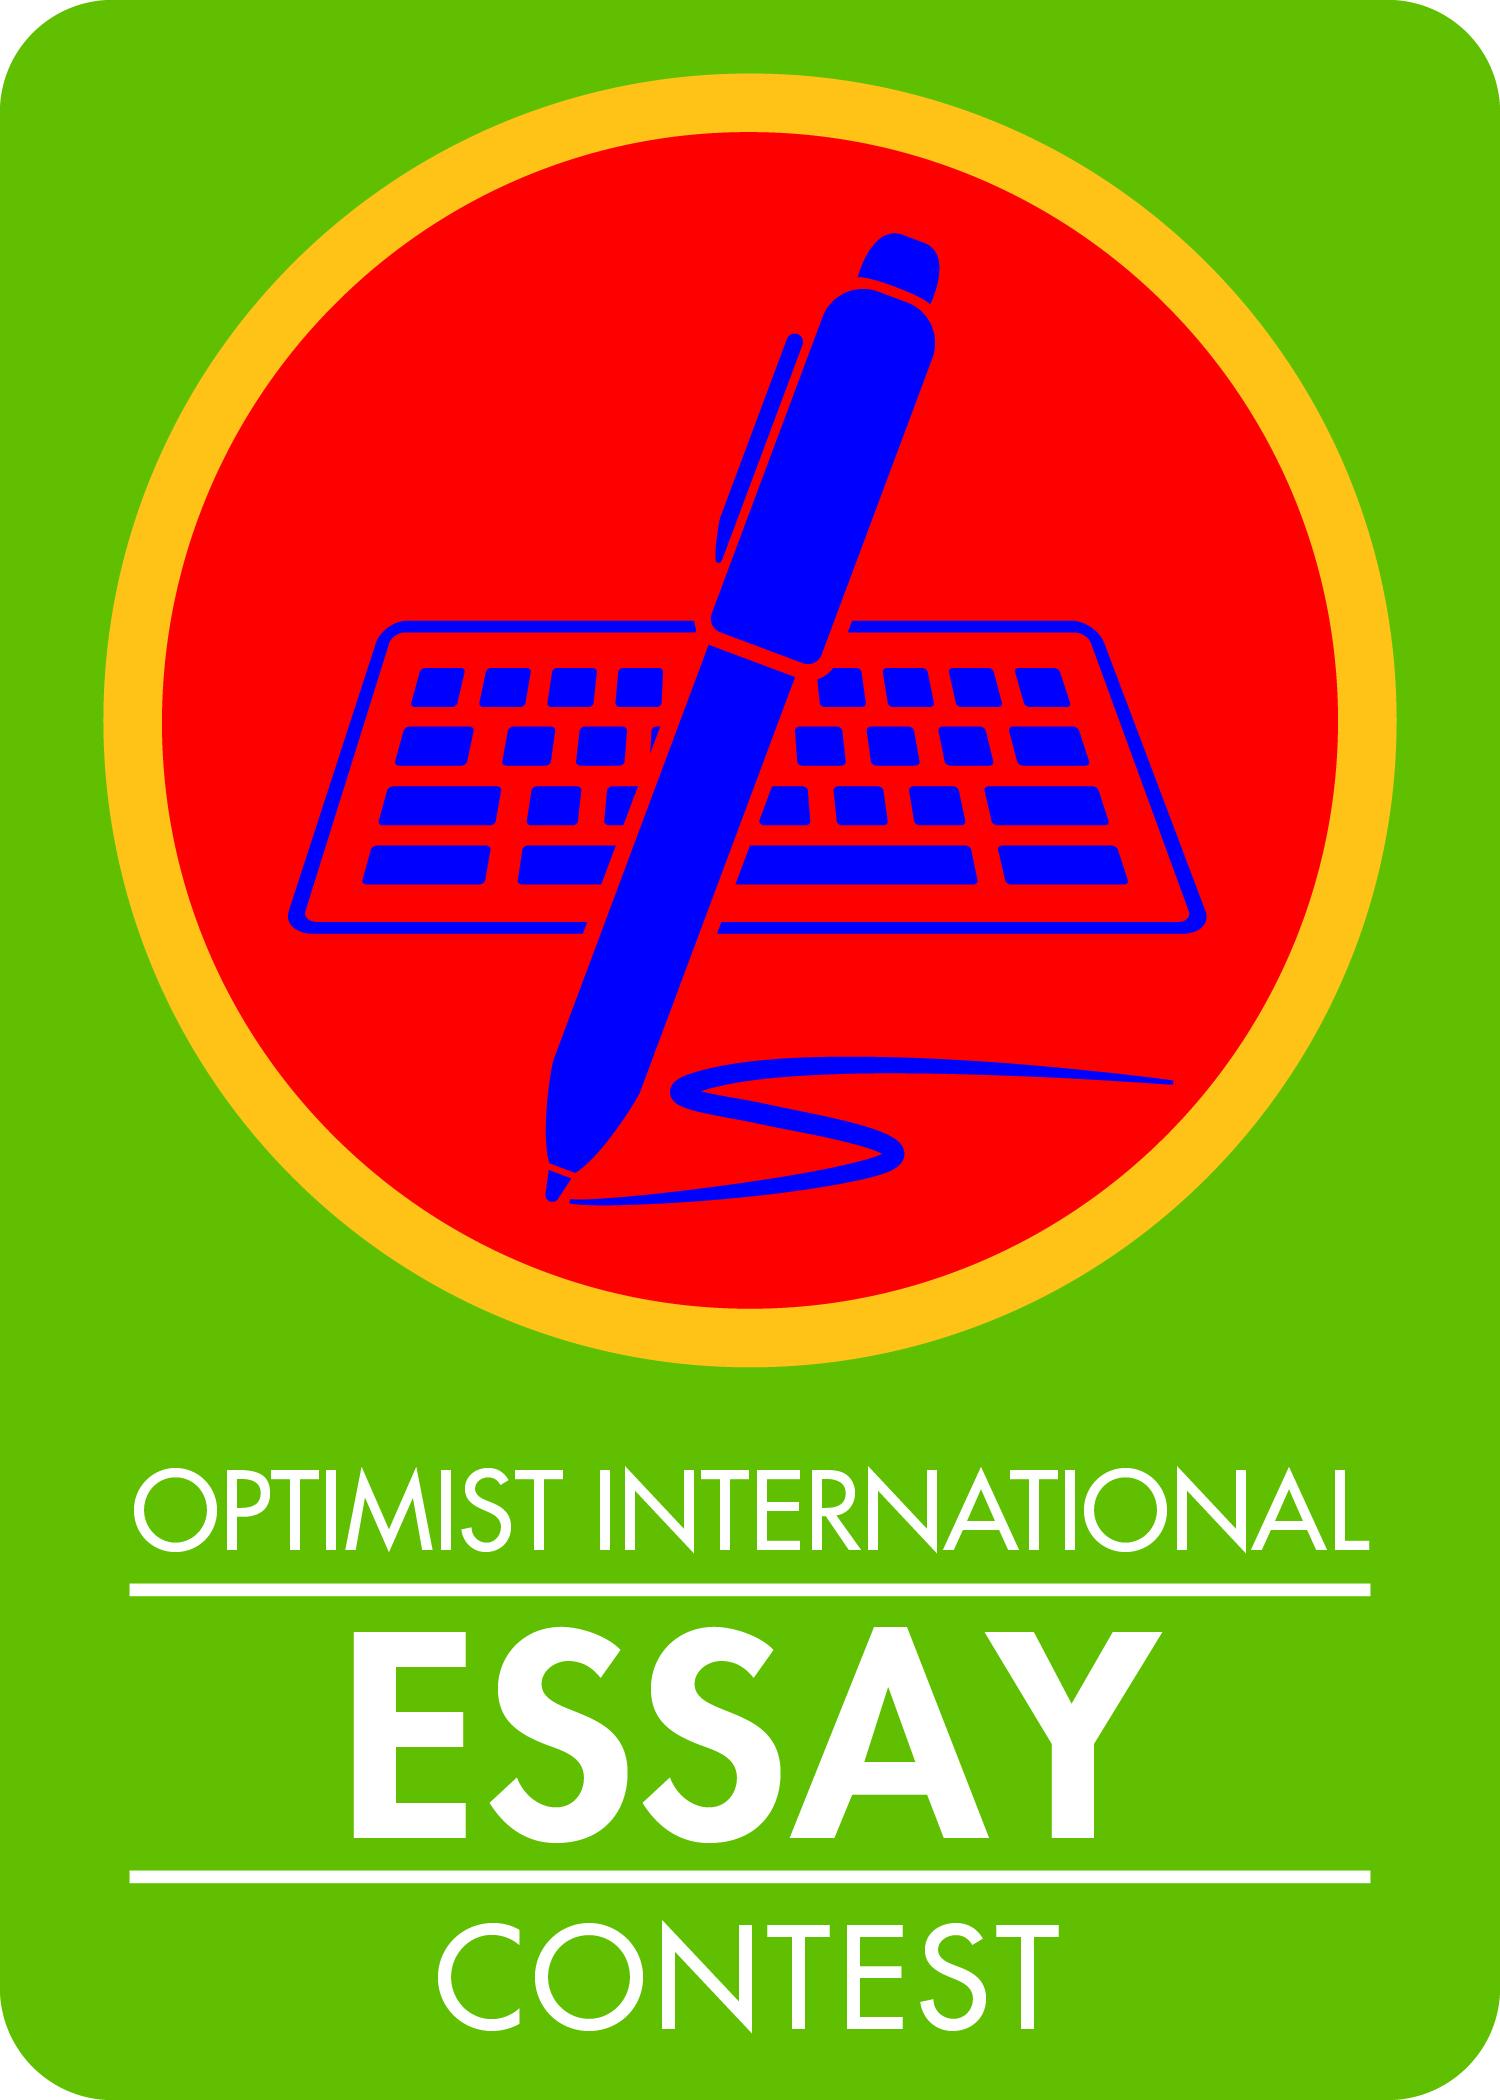 001 Essay Example High Res Optimist International Wondrous Contest Oratorical Winners Rules Full